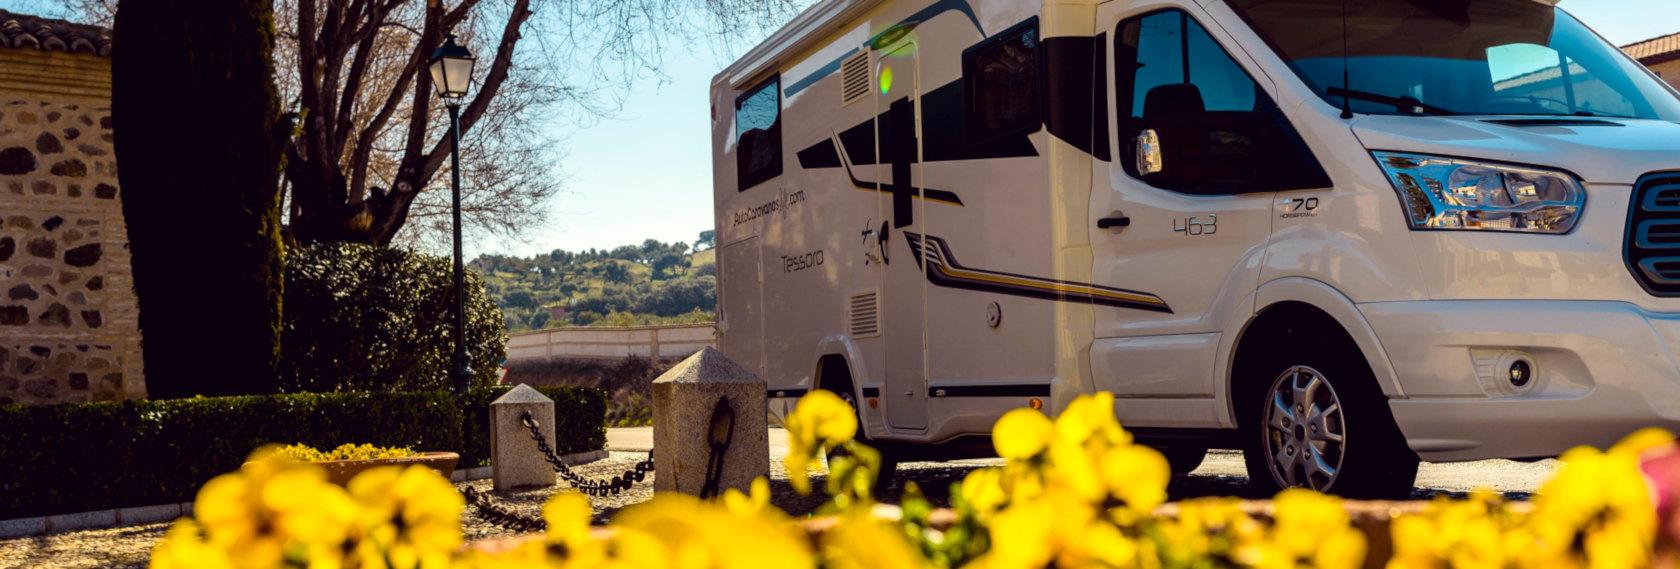 Alquiler de autocaravanas en Toledo y Madrid